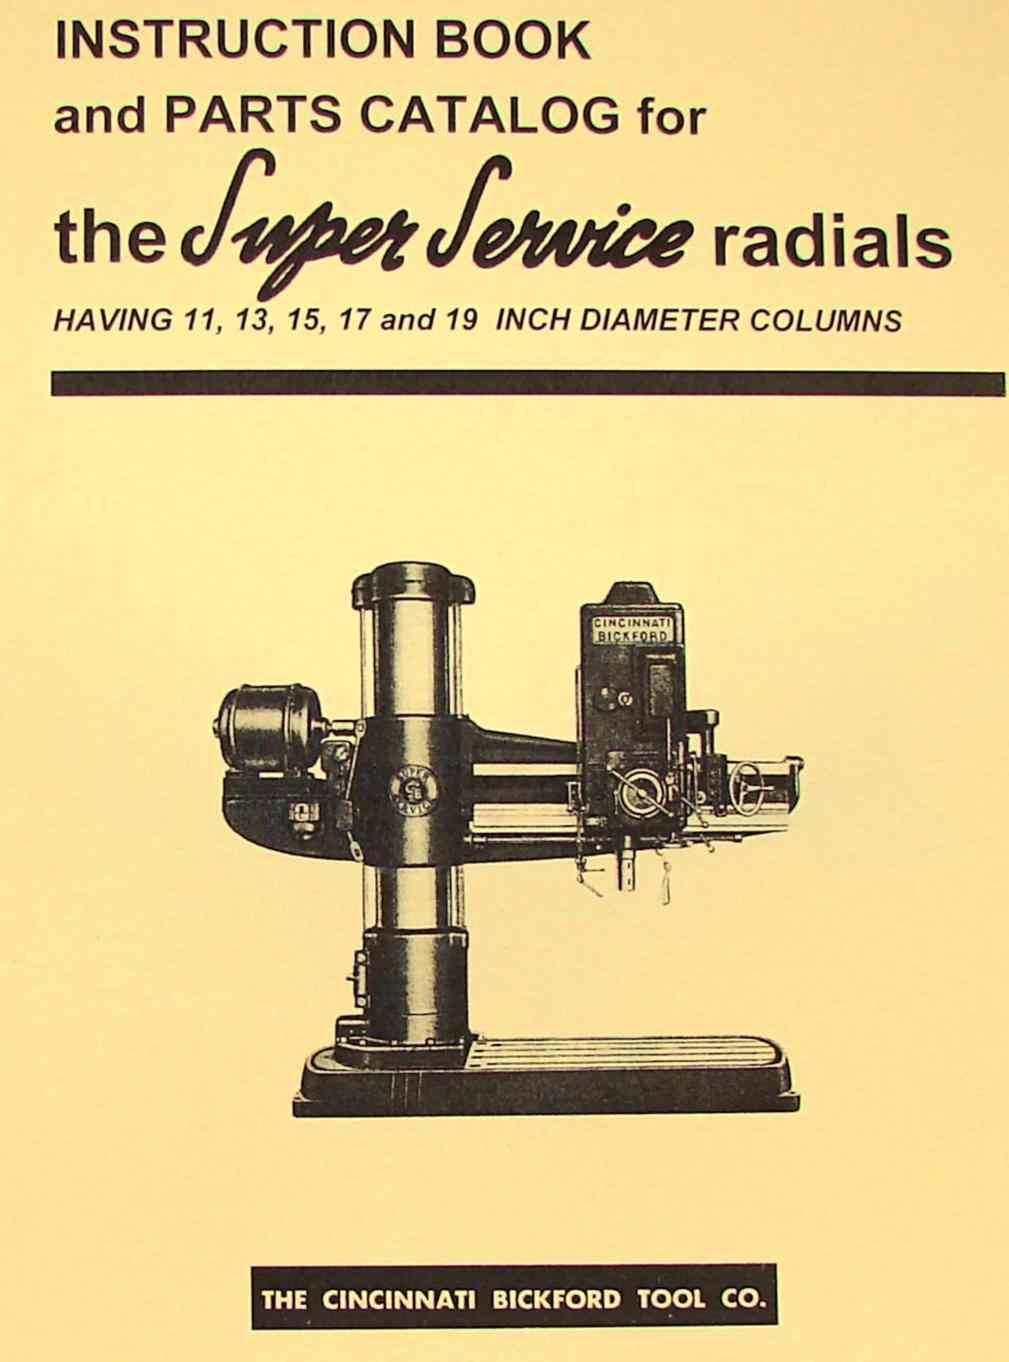 cincinnati bickford super service radial drill operator parts rh ozarktoolmanuals com cincinnati bickford radial arm drill manual Cincinnati Bickford Drill Press